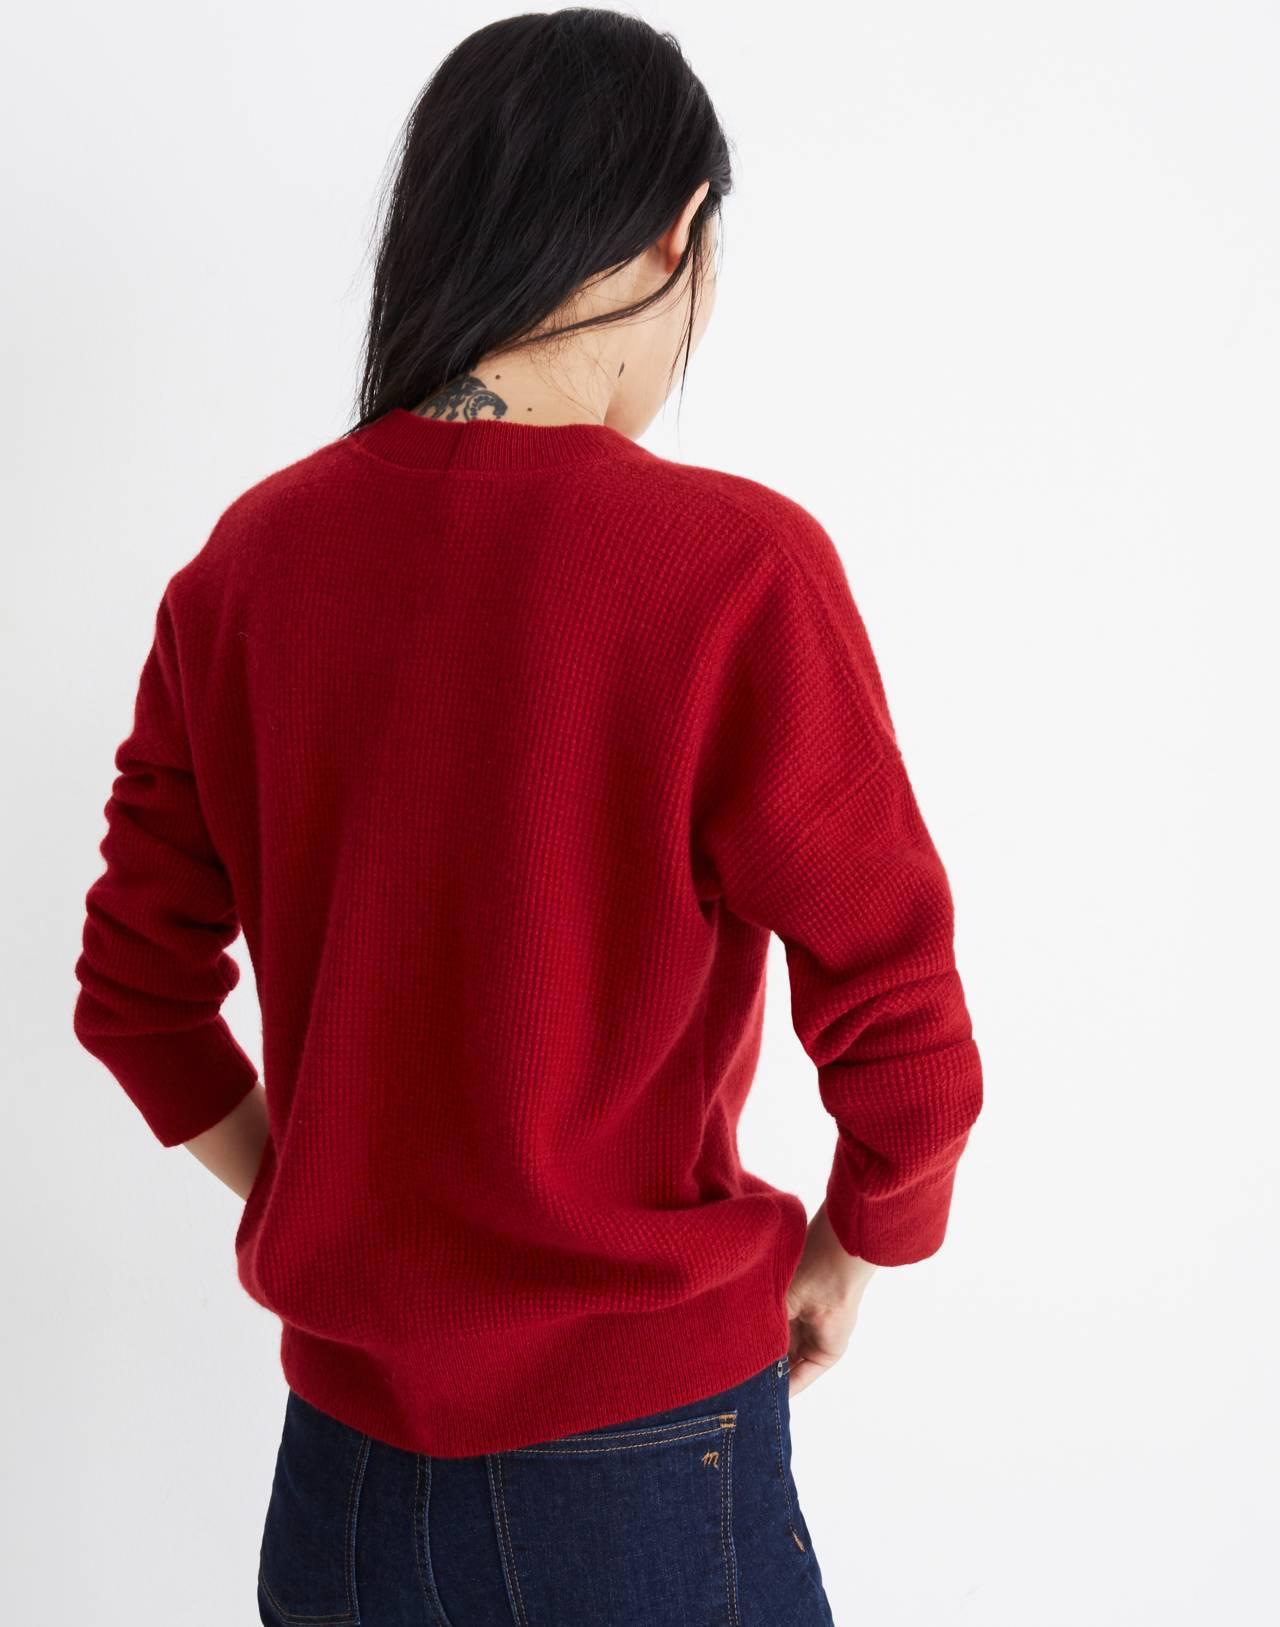 Cashmere Sweatshirt in crimson red image 3